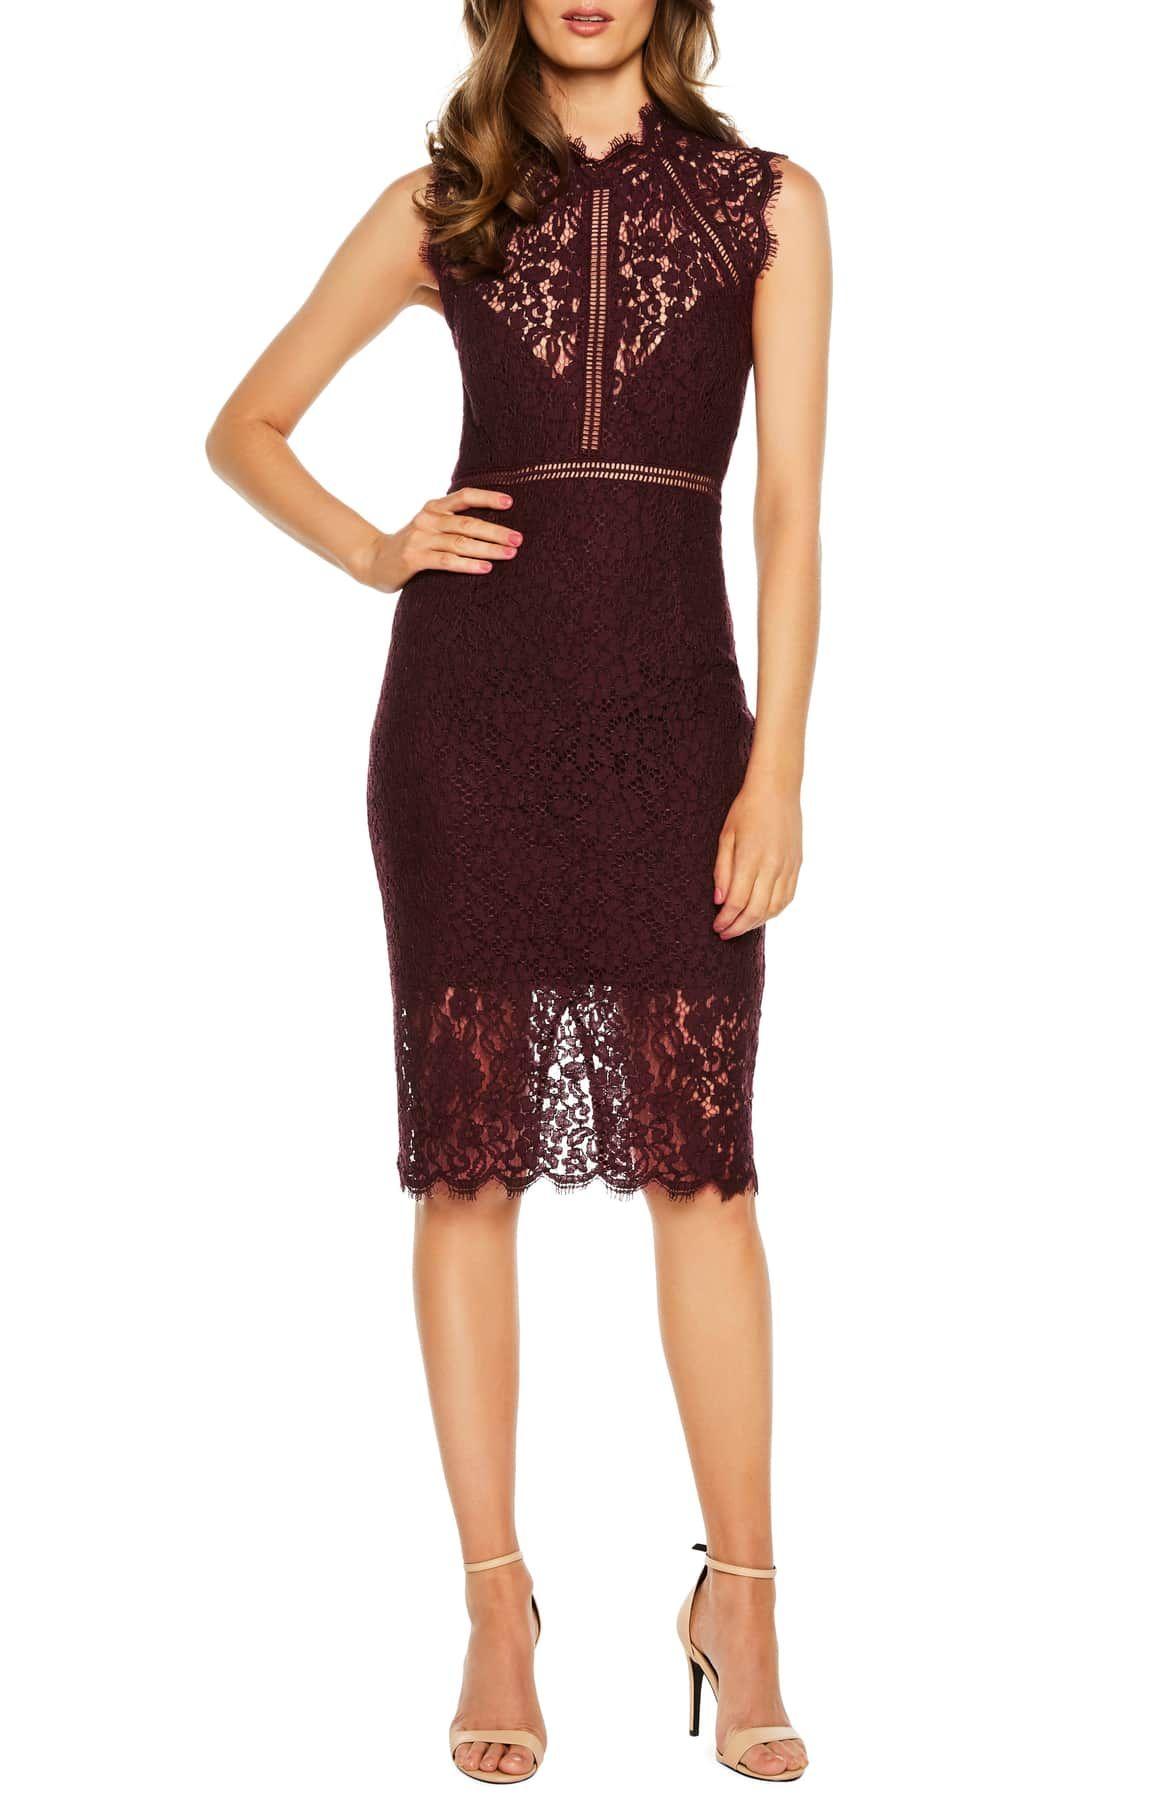 Bardot Lace Sheath Cocktail Dress Nordstrom Cocktail Dress Lace Lace Sheath Dress Dresses [ 1794 x 1170 Pixel ]